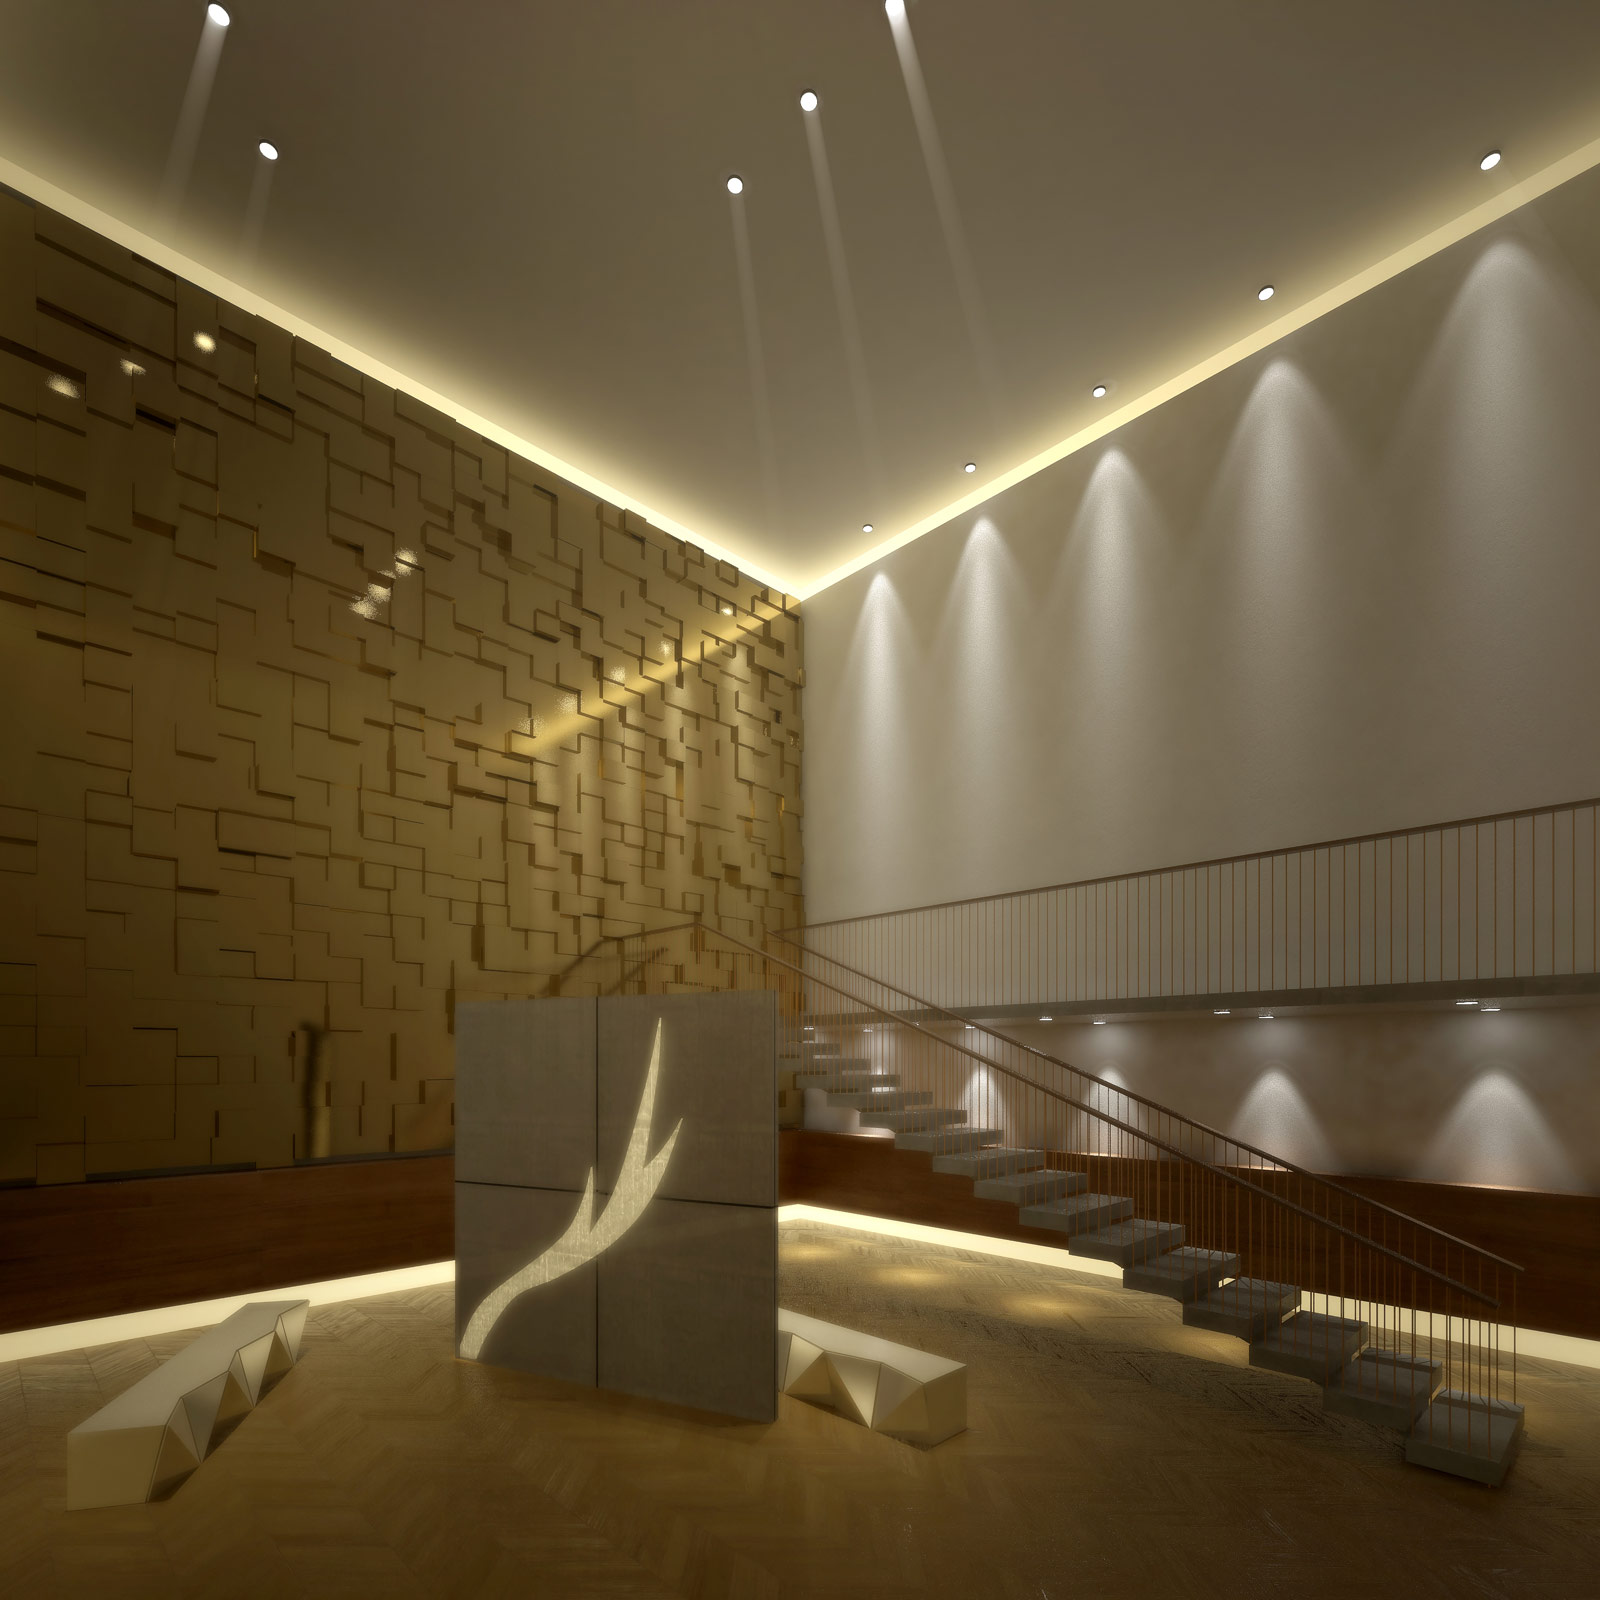 Atara design hinterleuchtete wandfassadeparavent - Zeitungsstander wand design ...